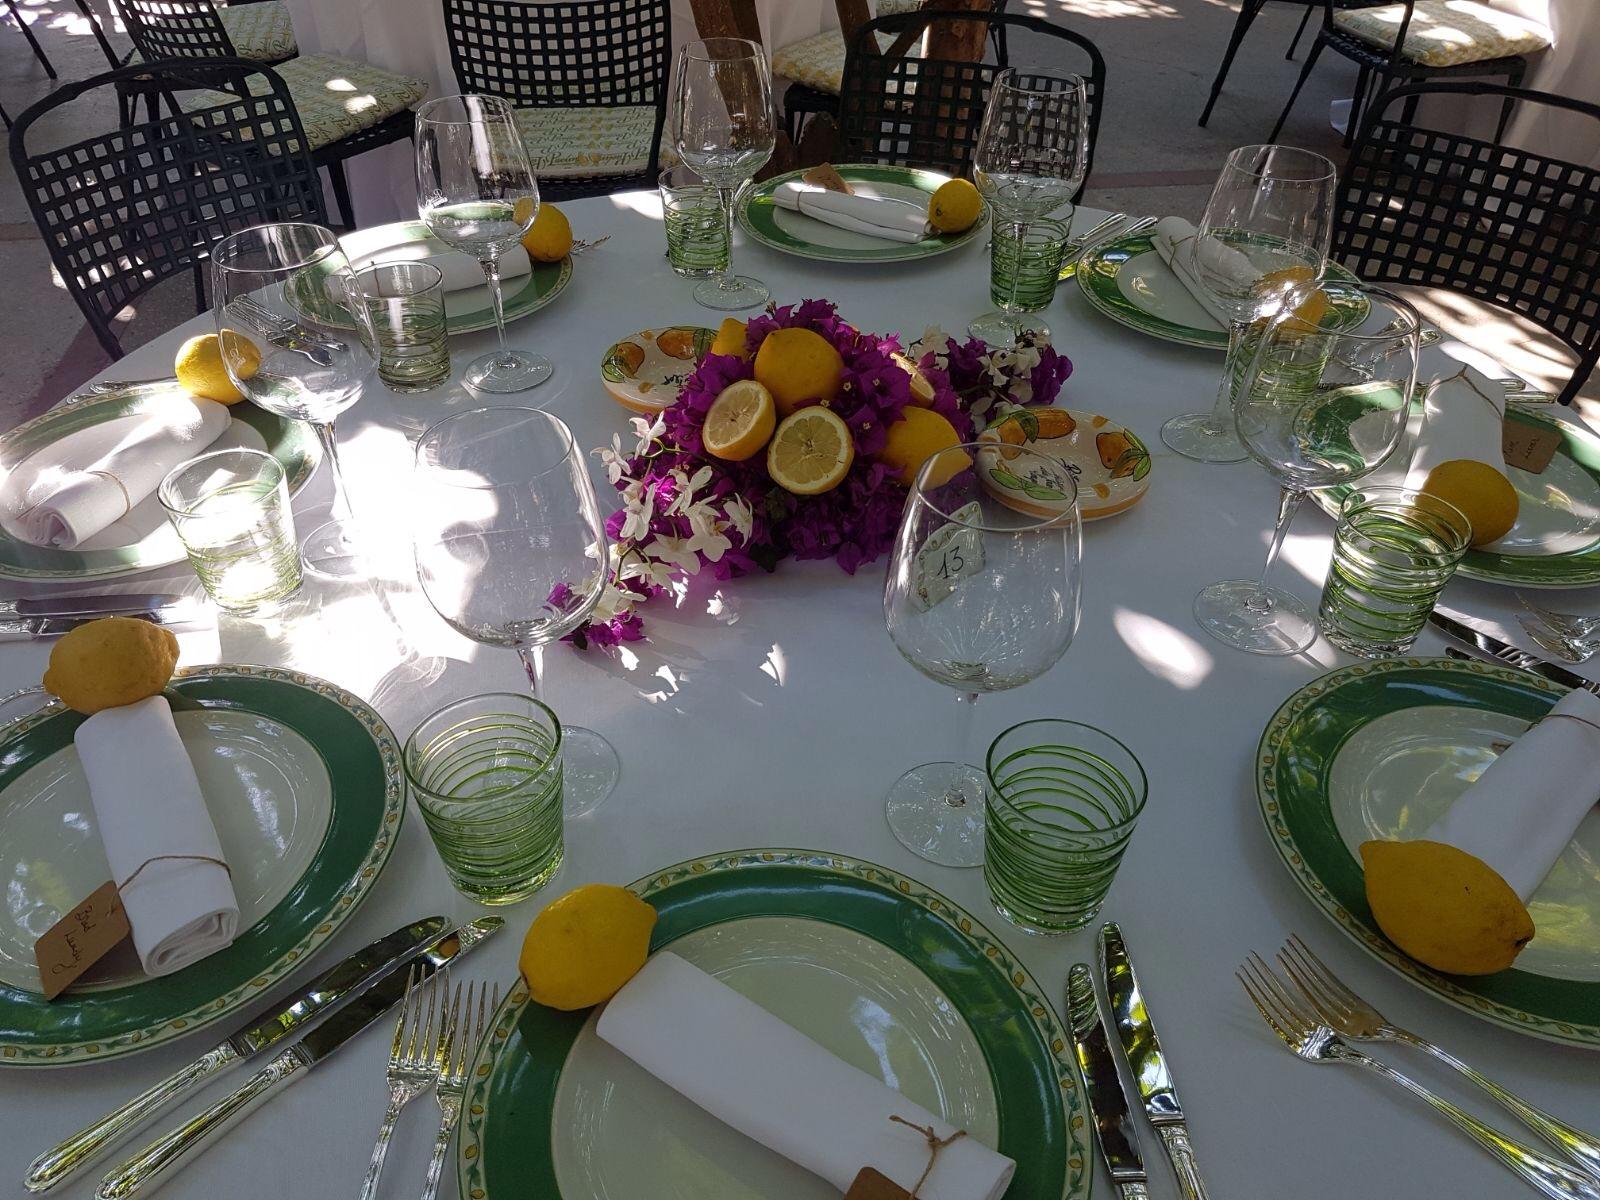 http://www.weddingamalfi.com/wp-content/uploads/Nathalie-and-Benjamin-wedding-day-in-Positano-3.jpg